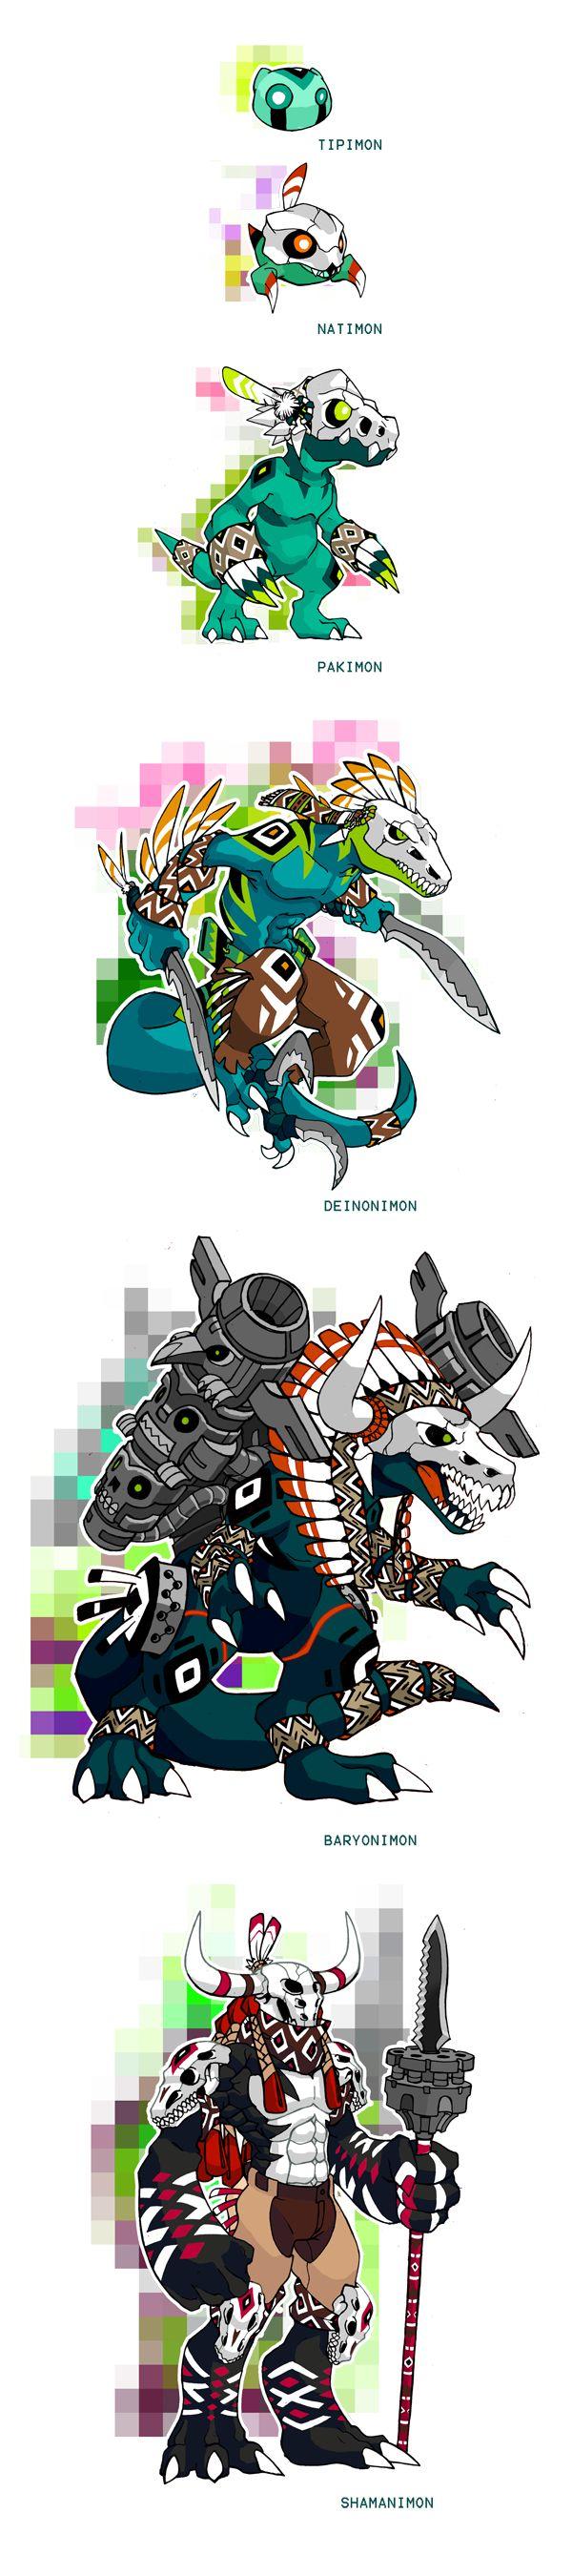 Native Fossil Digimon Line by Darksilvania on DeviantArt